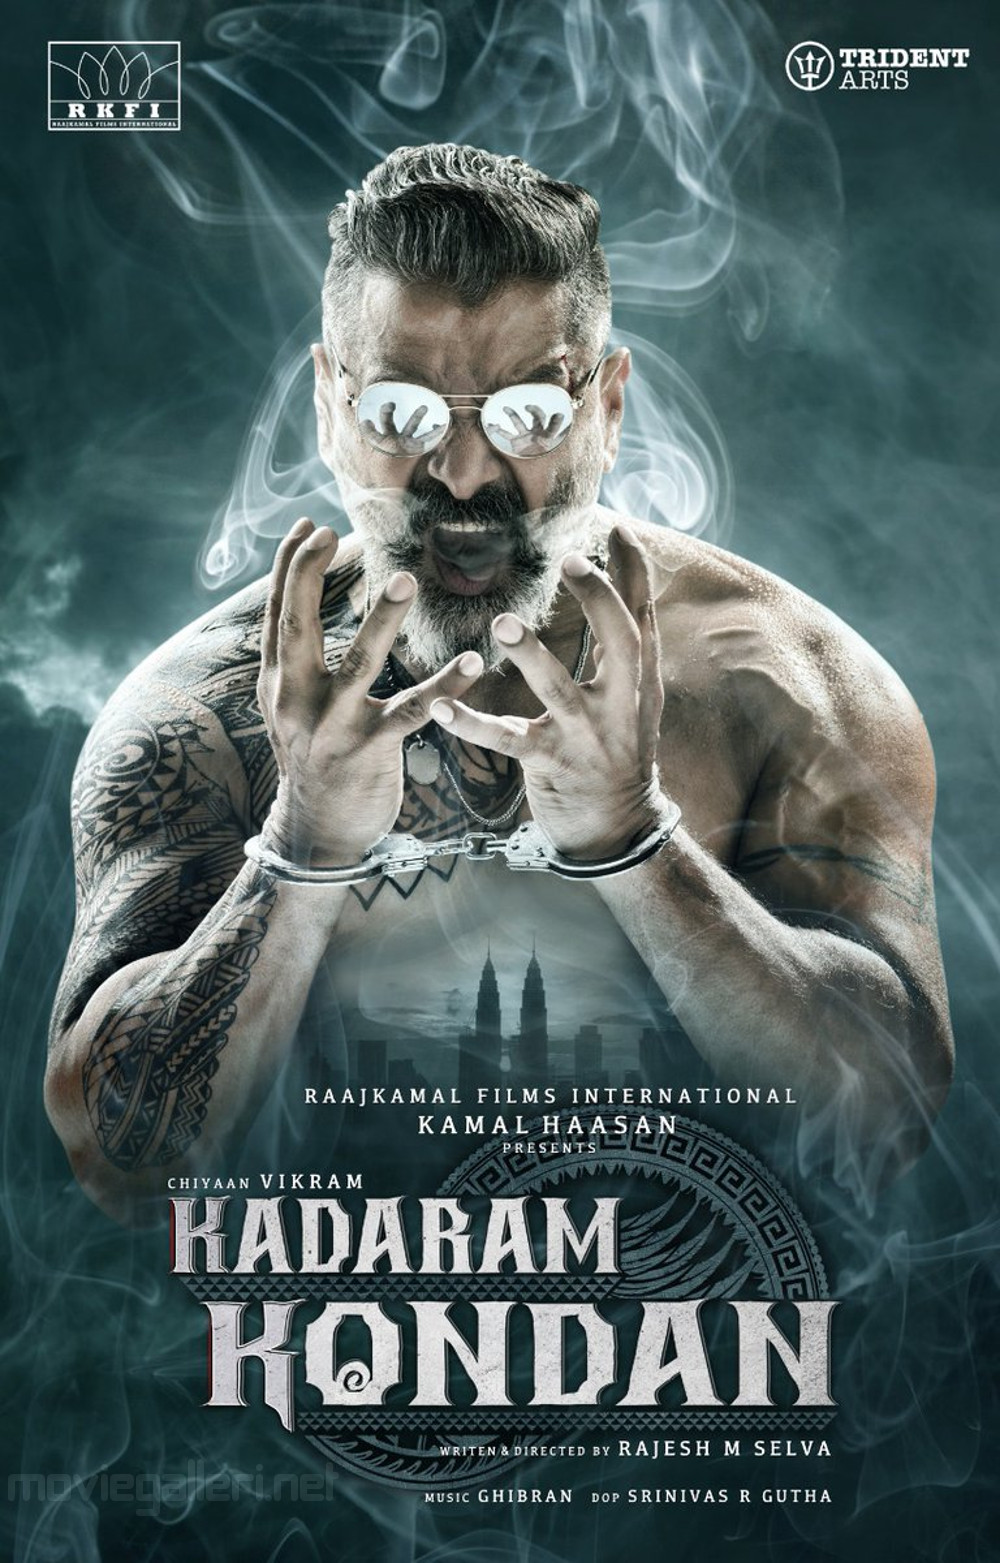 Chiyaan Vikram Kadaram Kondan First Look Poster HD